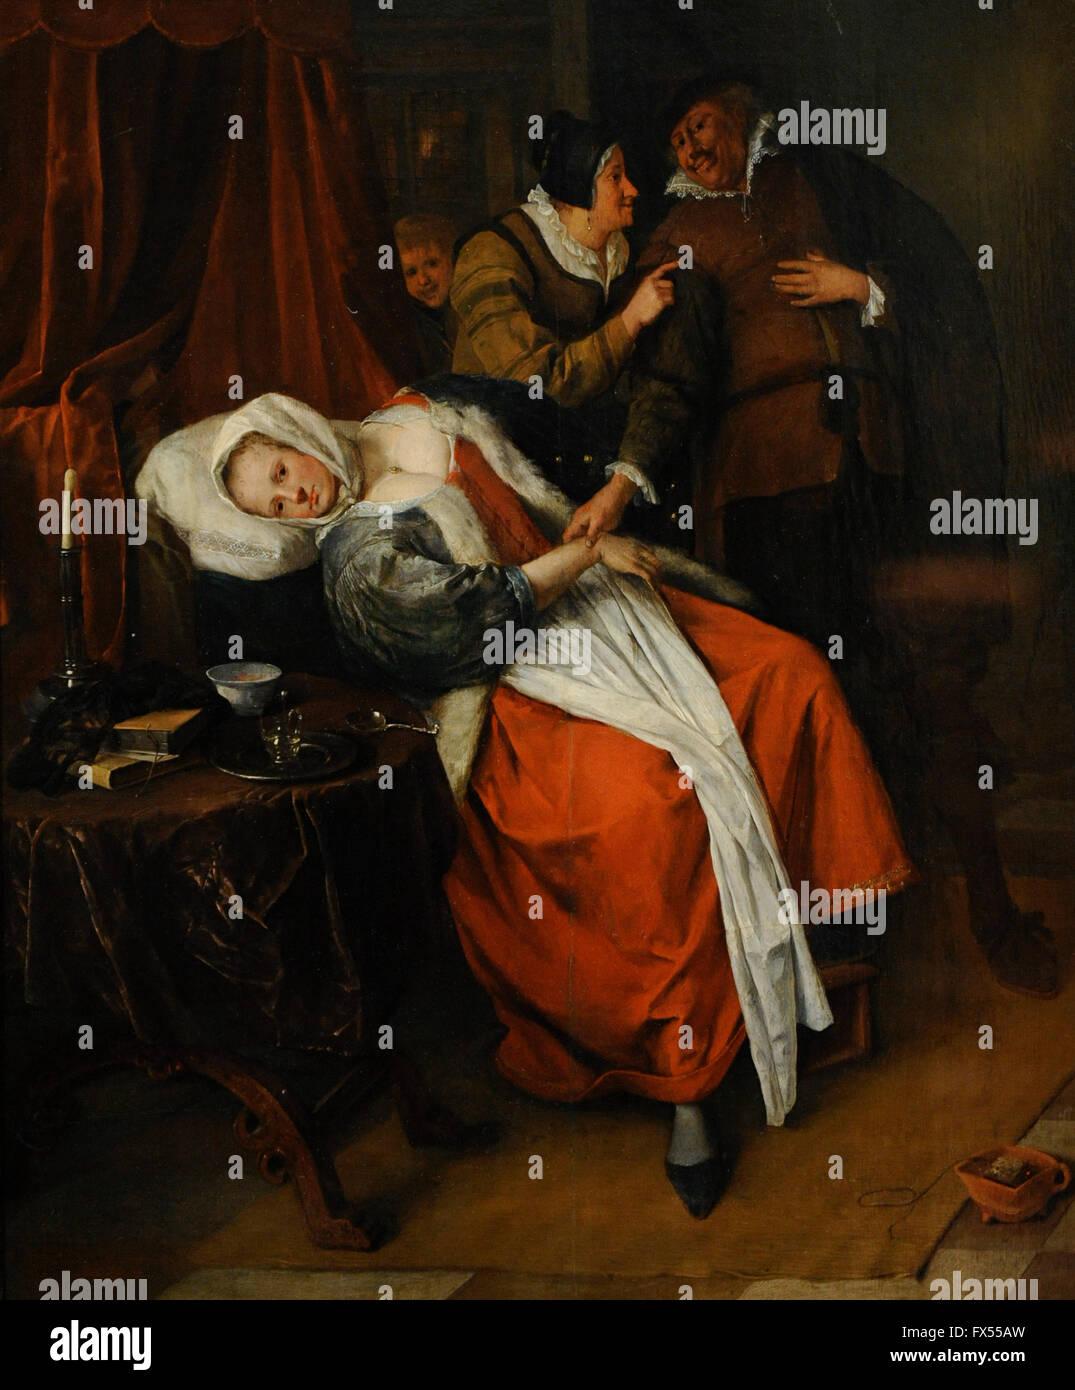 Jan Havickszoon Steen (1626-1679). Dutch painter. Doctor's Visit, c.1660. The State Hermitage Museum. Saint Petersburg. Stock Photo